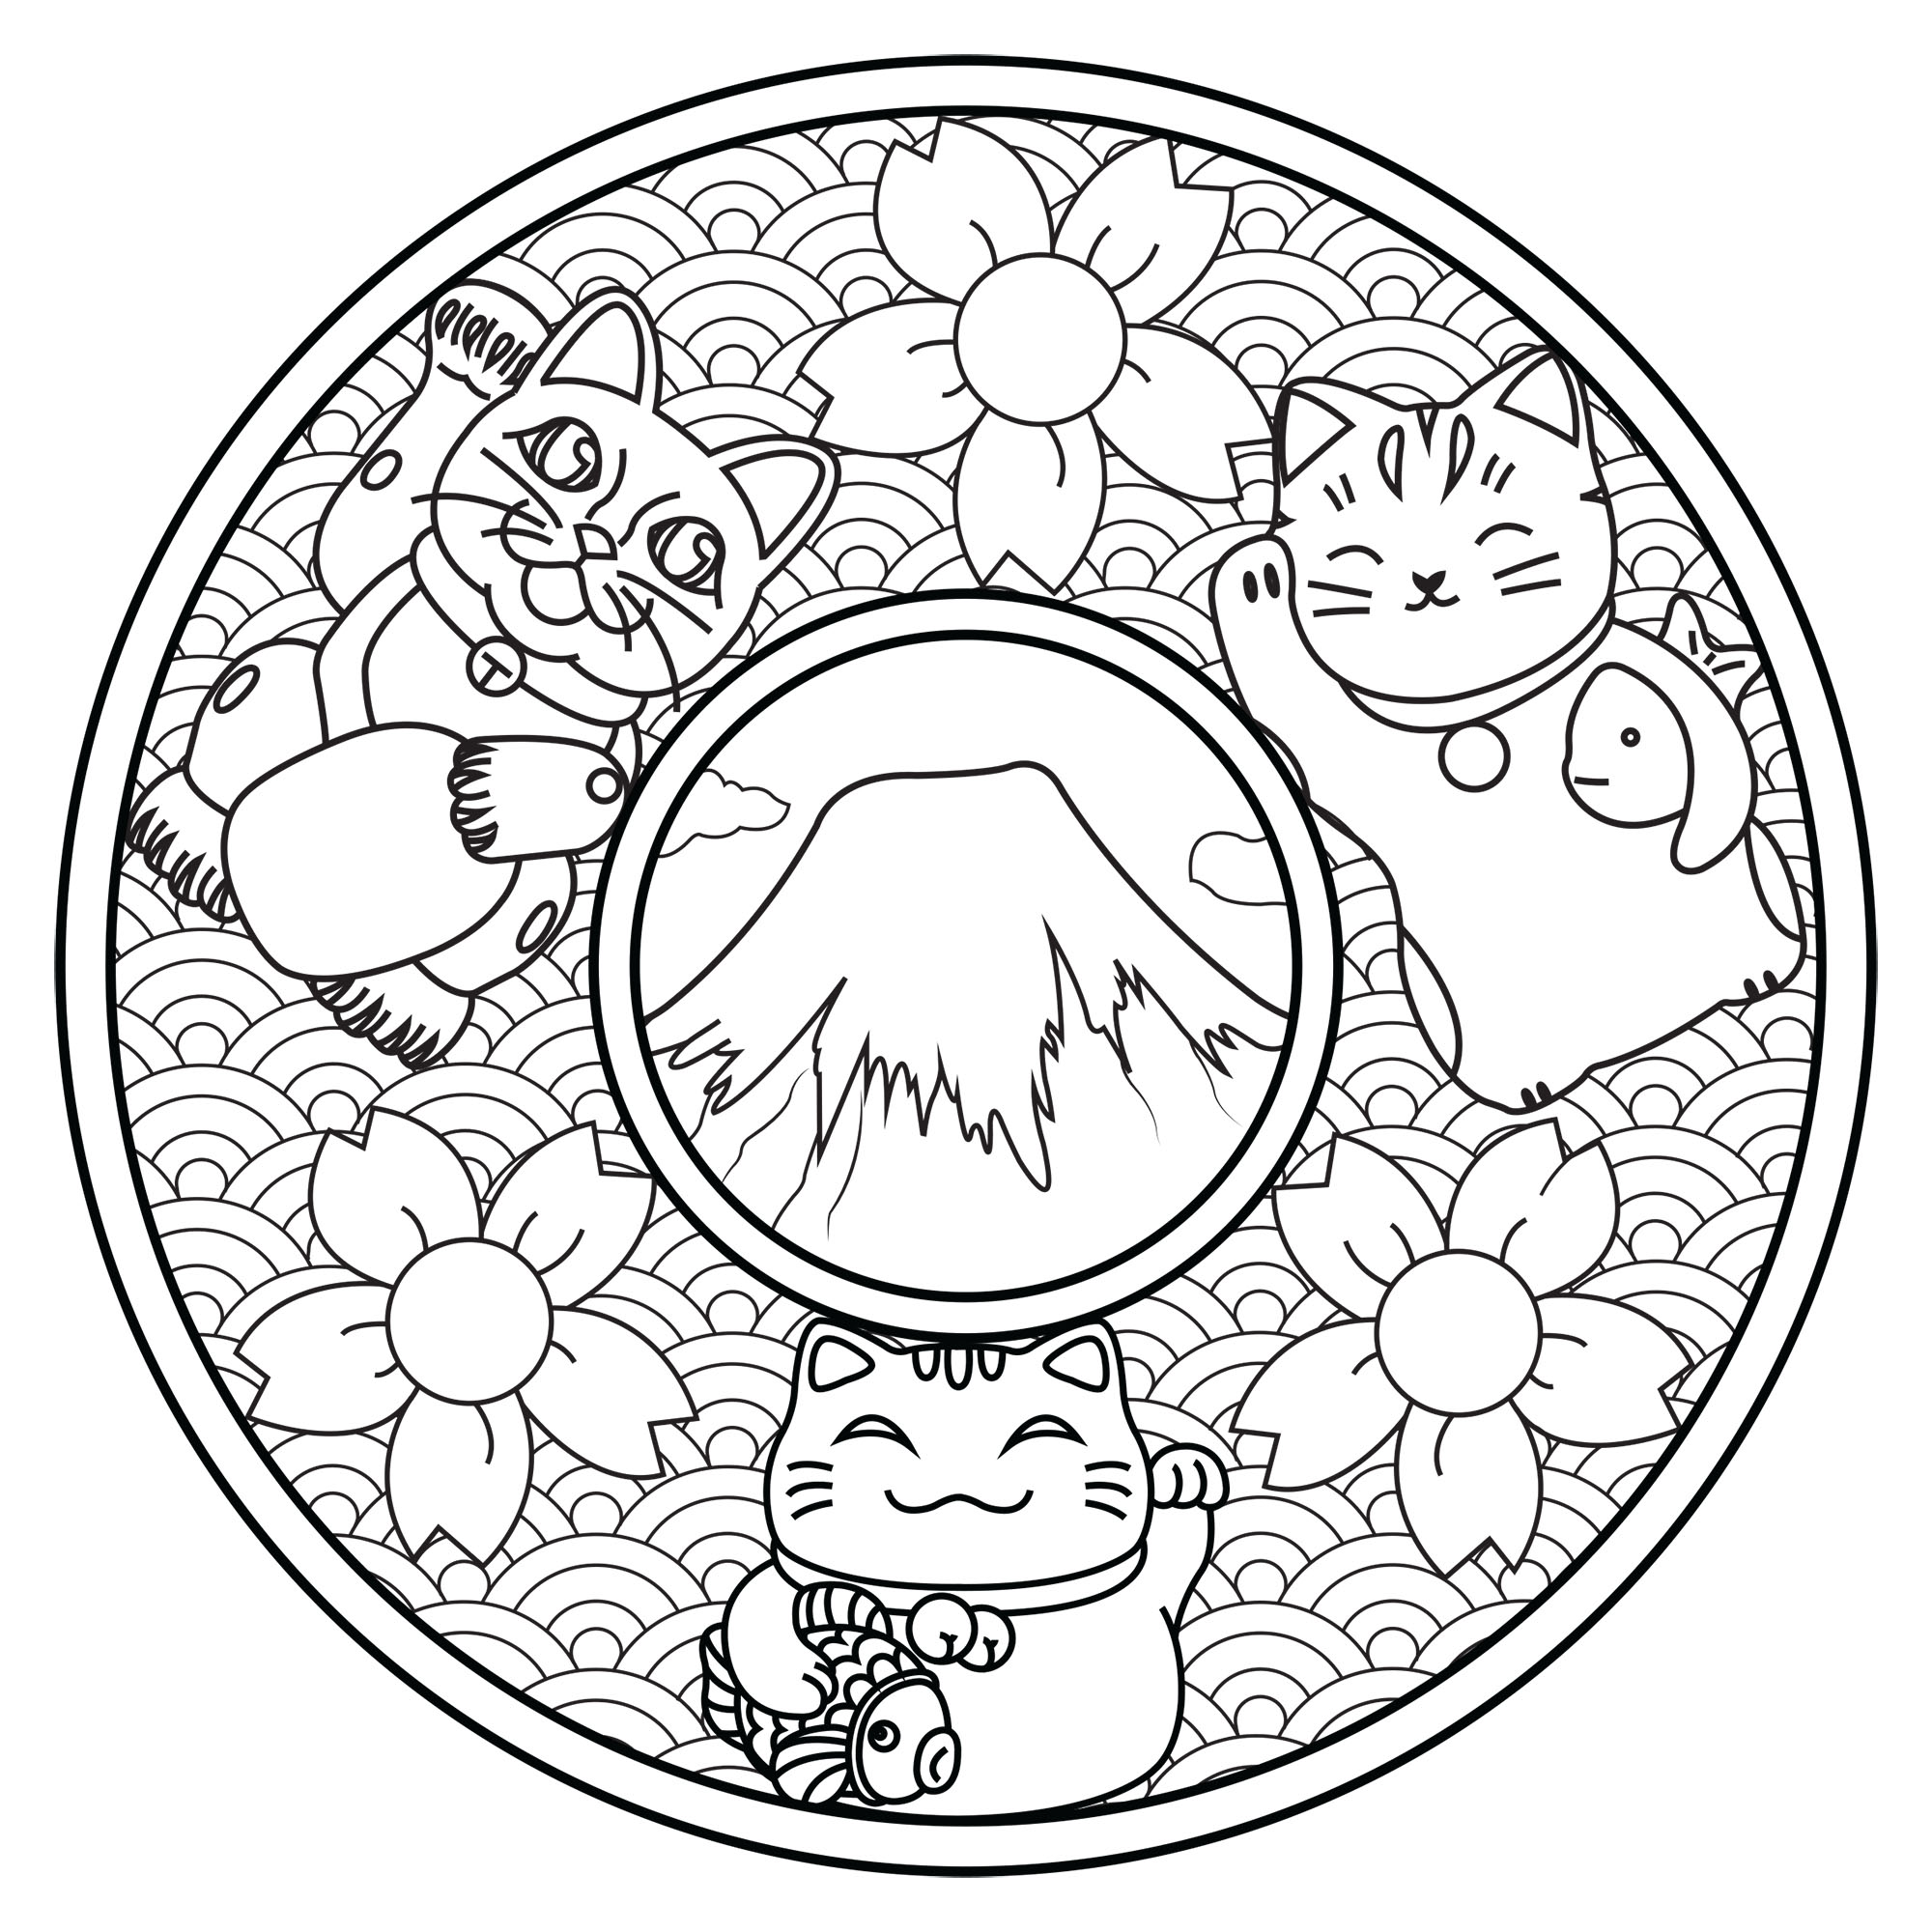 Malbuch Fur Erwachsene : Mandalas - 1